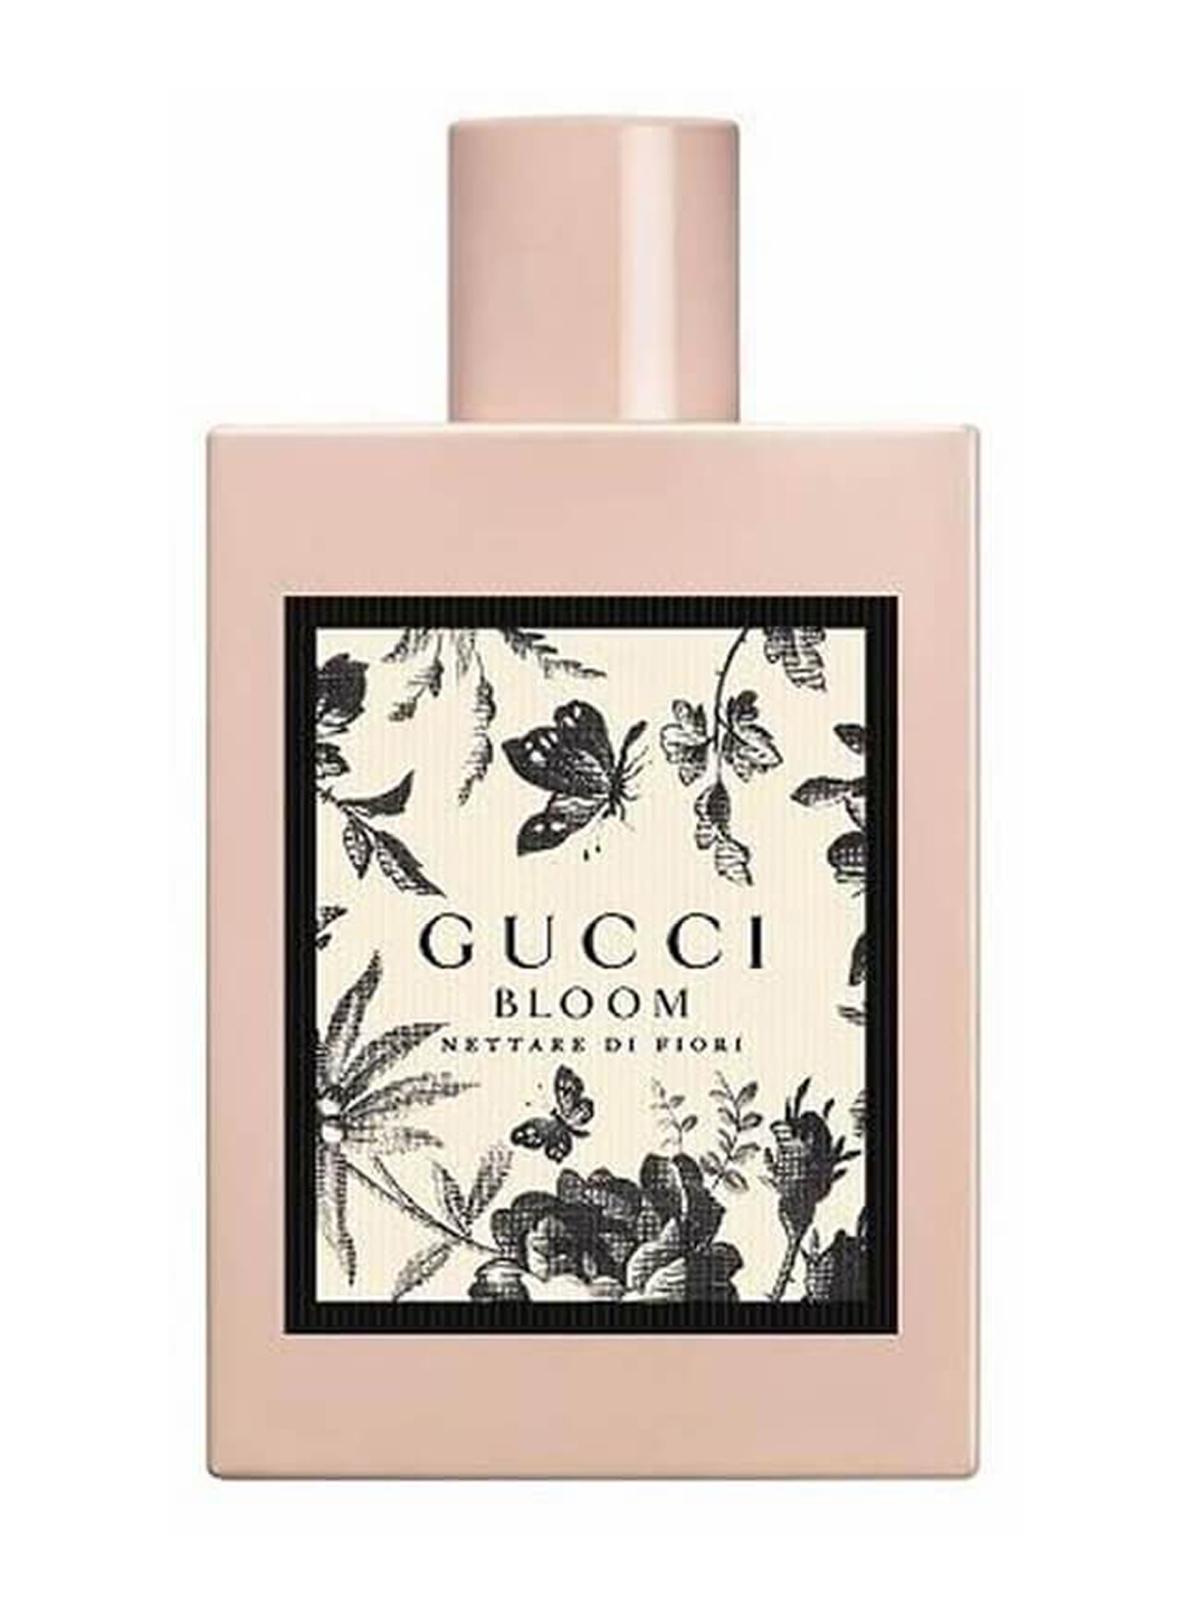 Gucci Bloom Nettare Di Fiori For Women Eau De Parfum